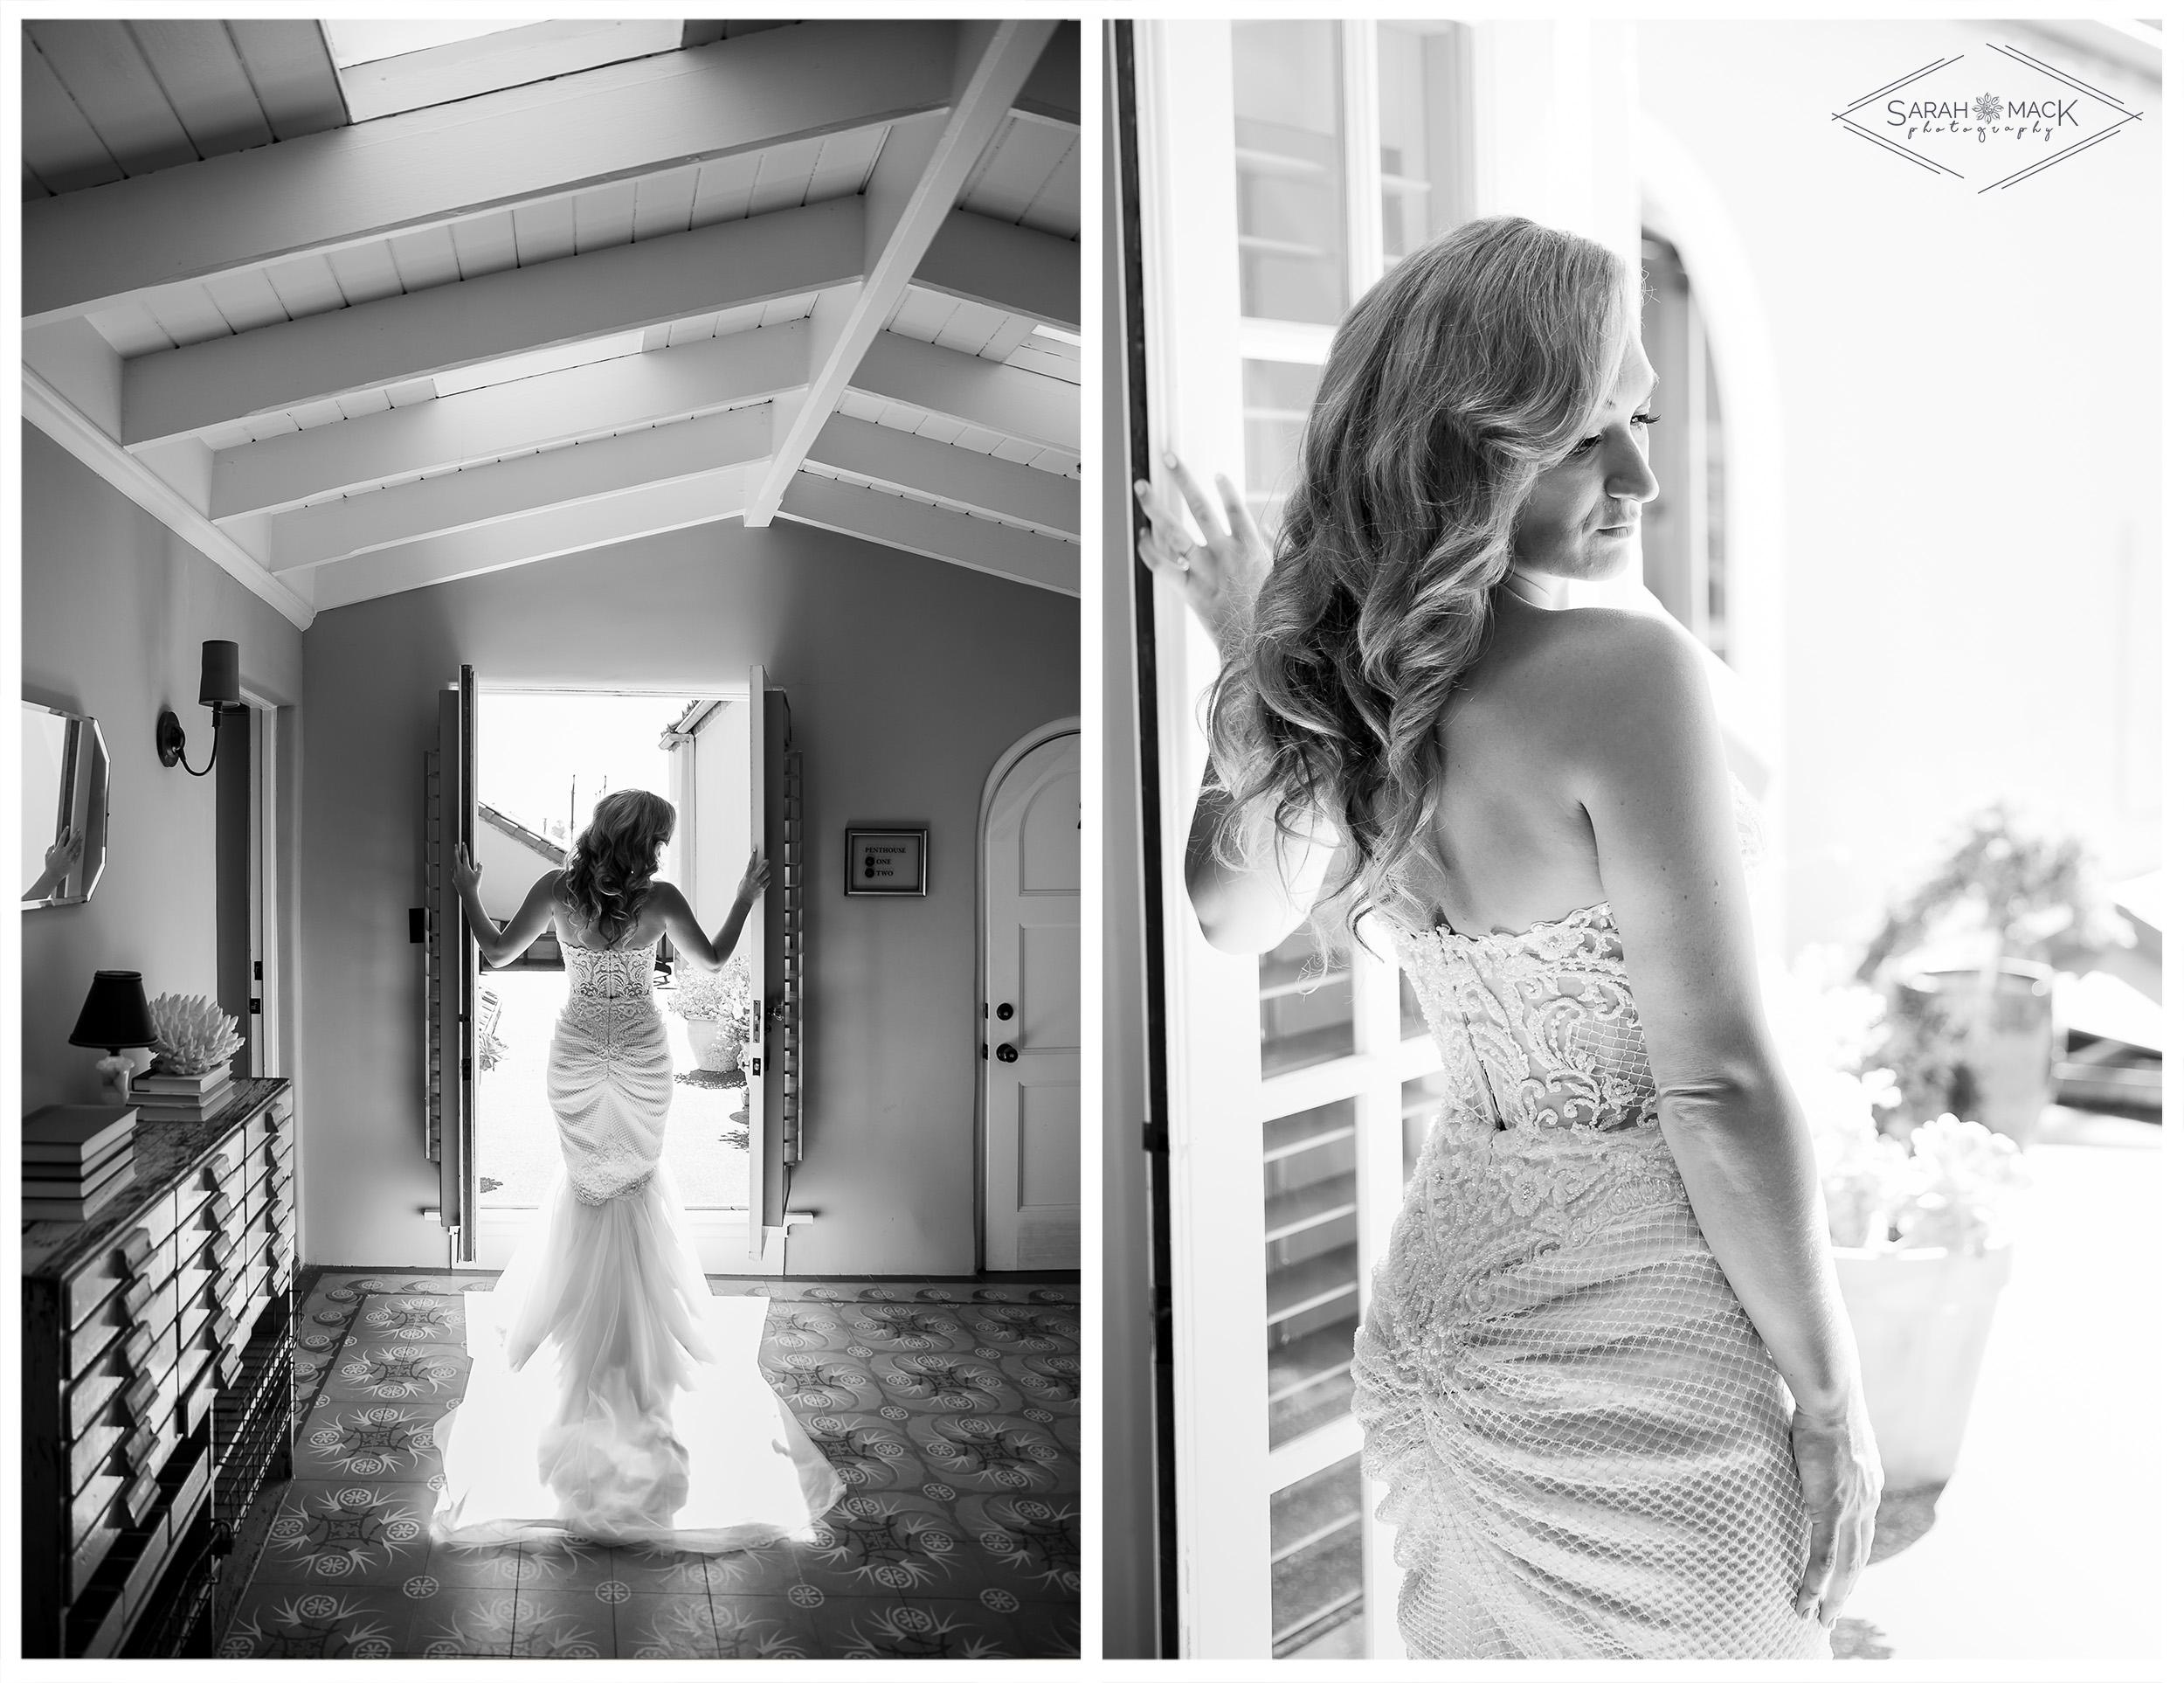 MK-Santa-Monica-Catholic-Church-Wedding-Photography-10.jpg